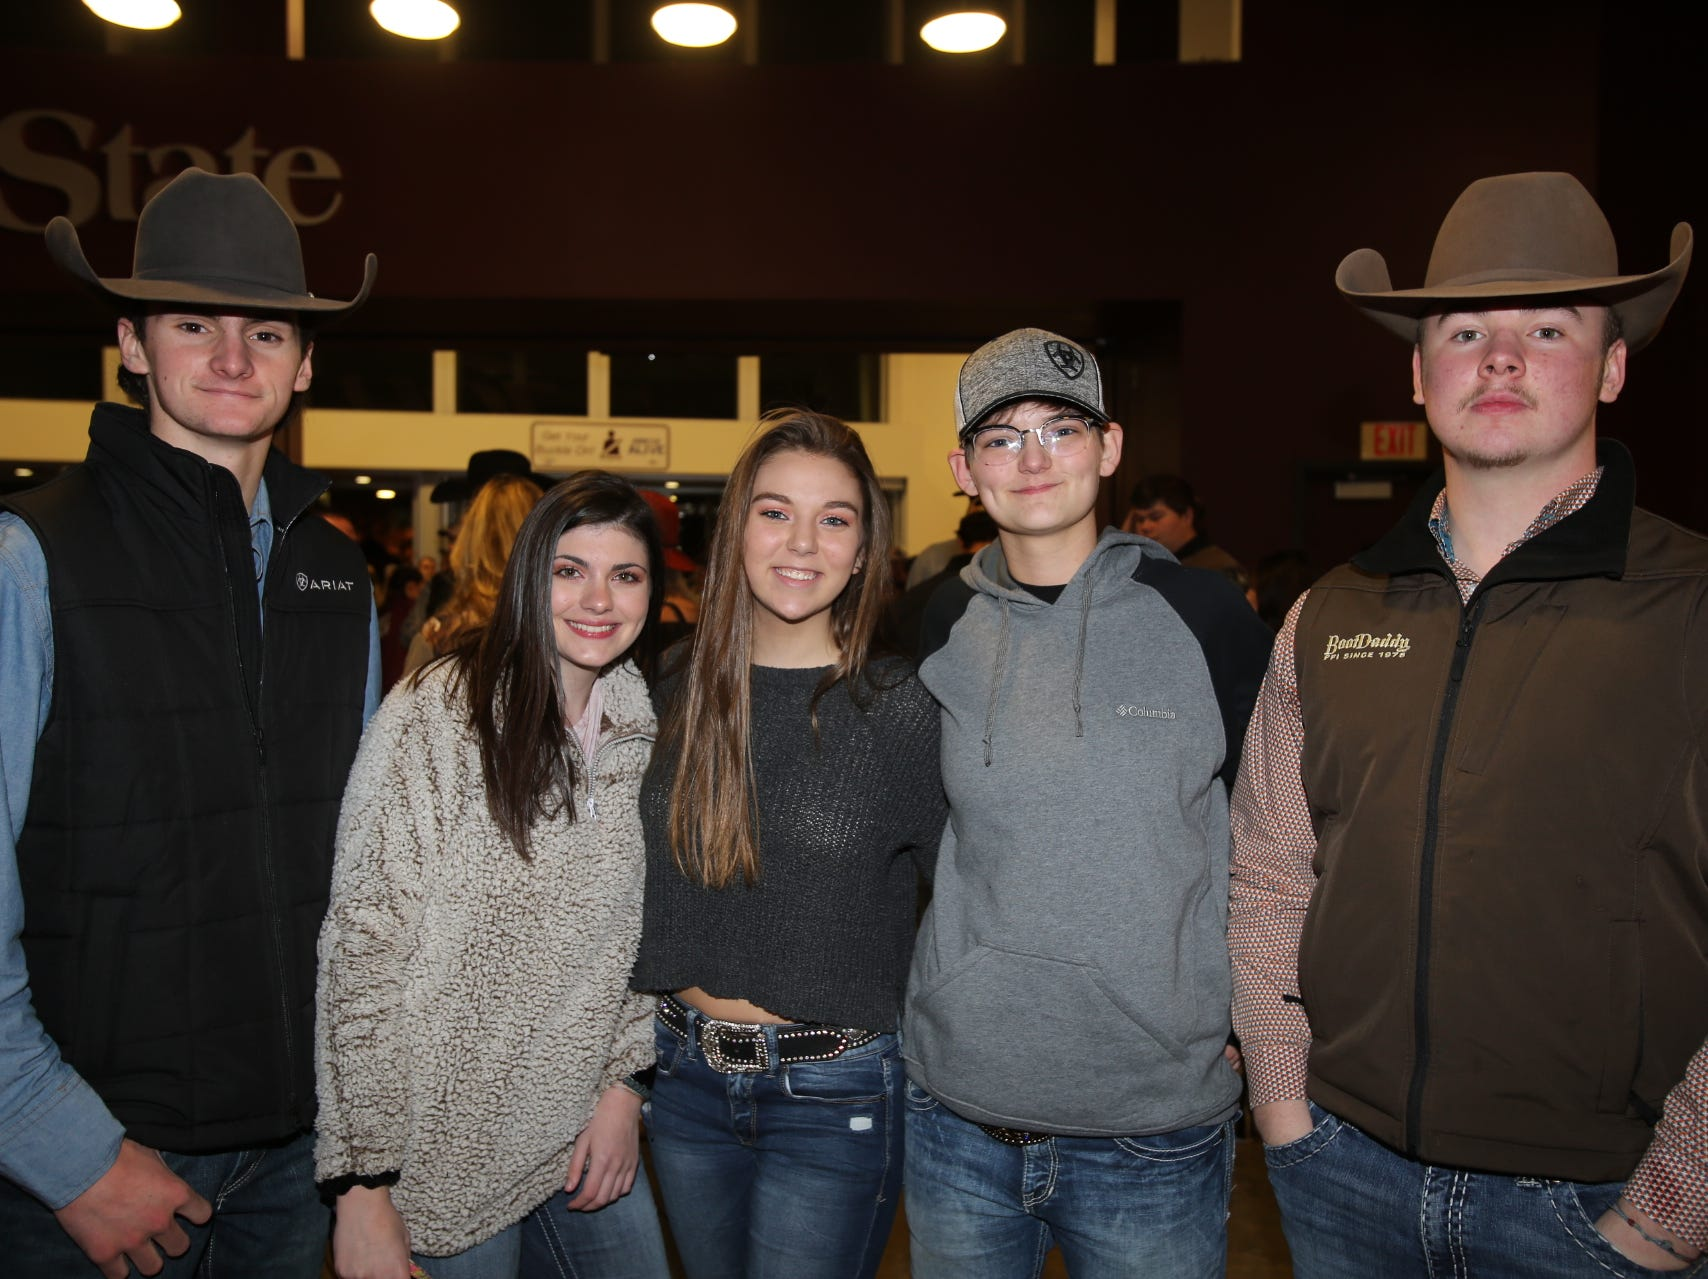 Brodie King, Tori Grinder, Shelby Jones, Skyler Lowery, and Sage Estes